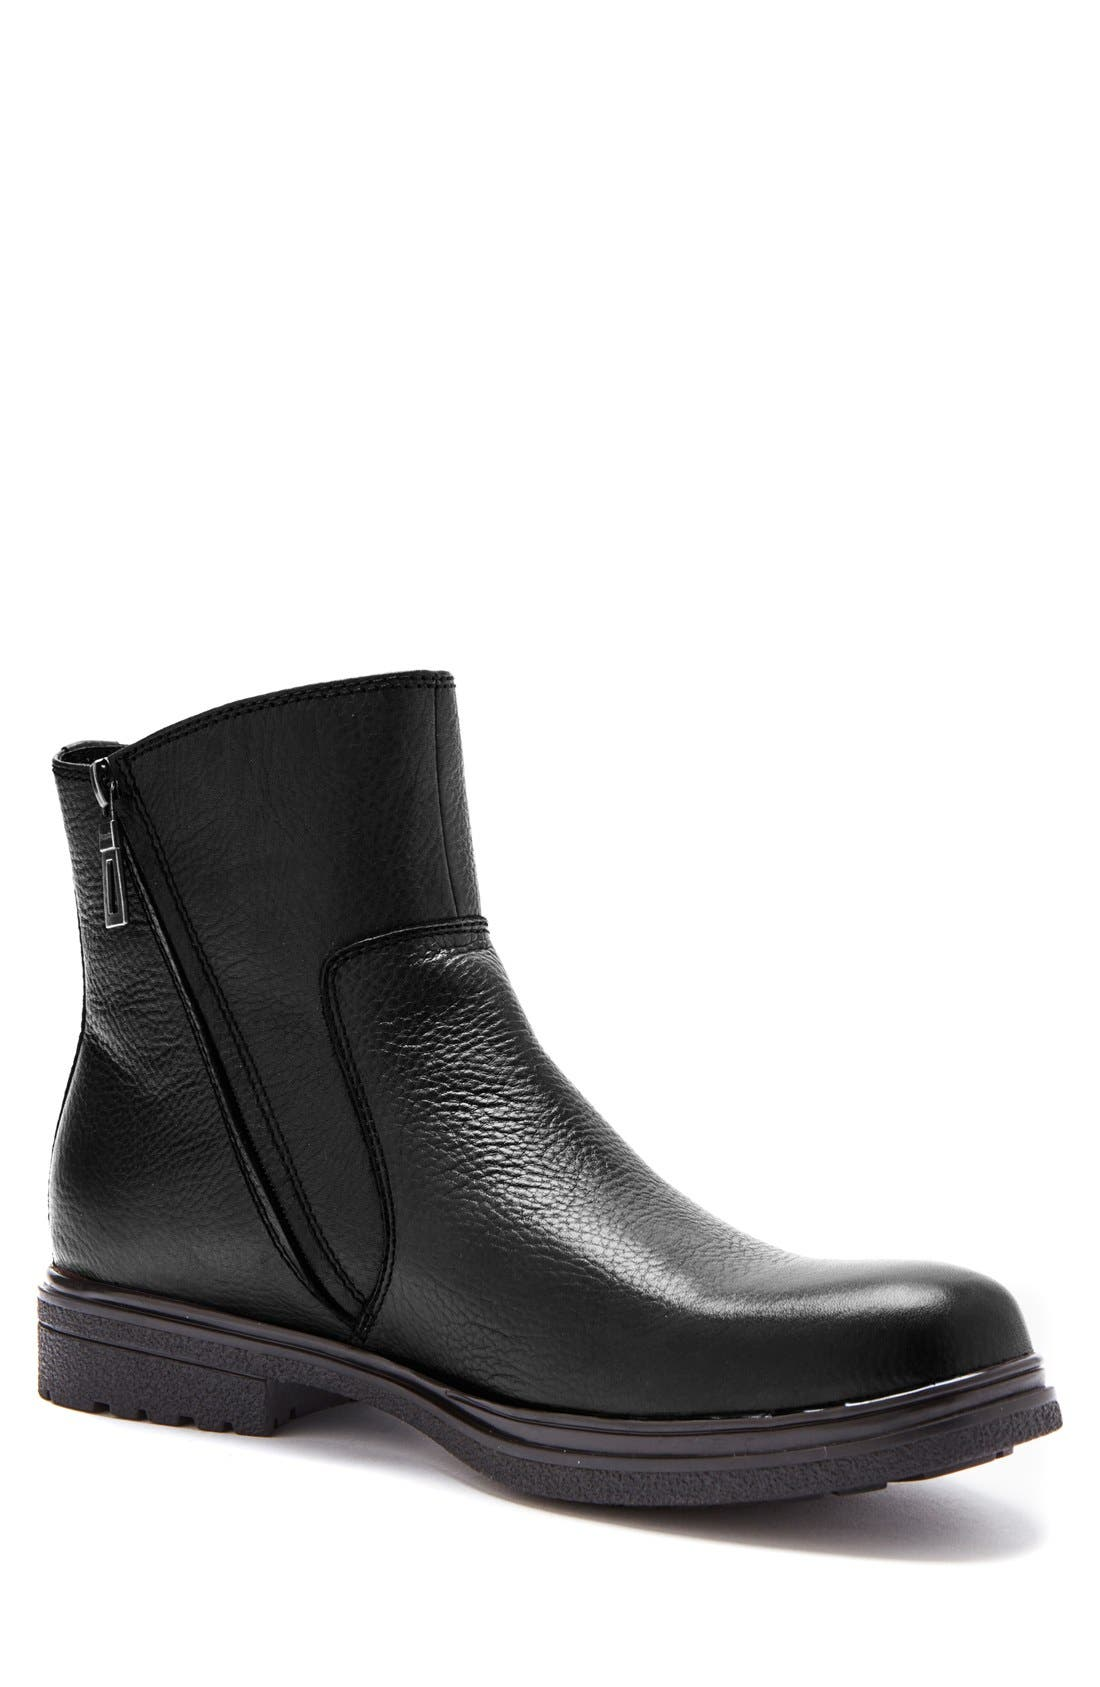 Main Image - Blondo 'Brawn' Waterproof Zip Boot (Men)